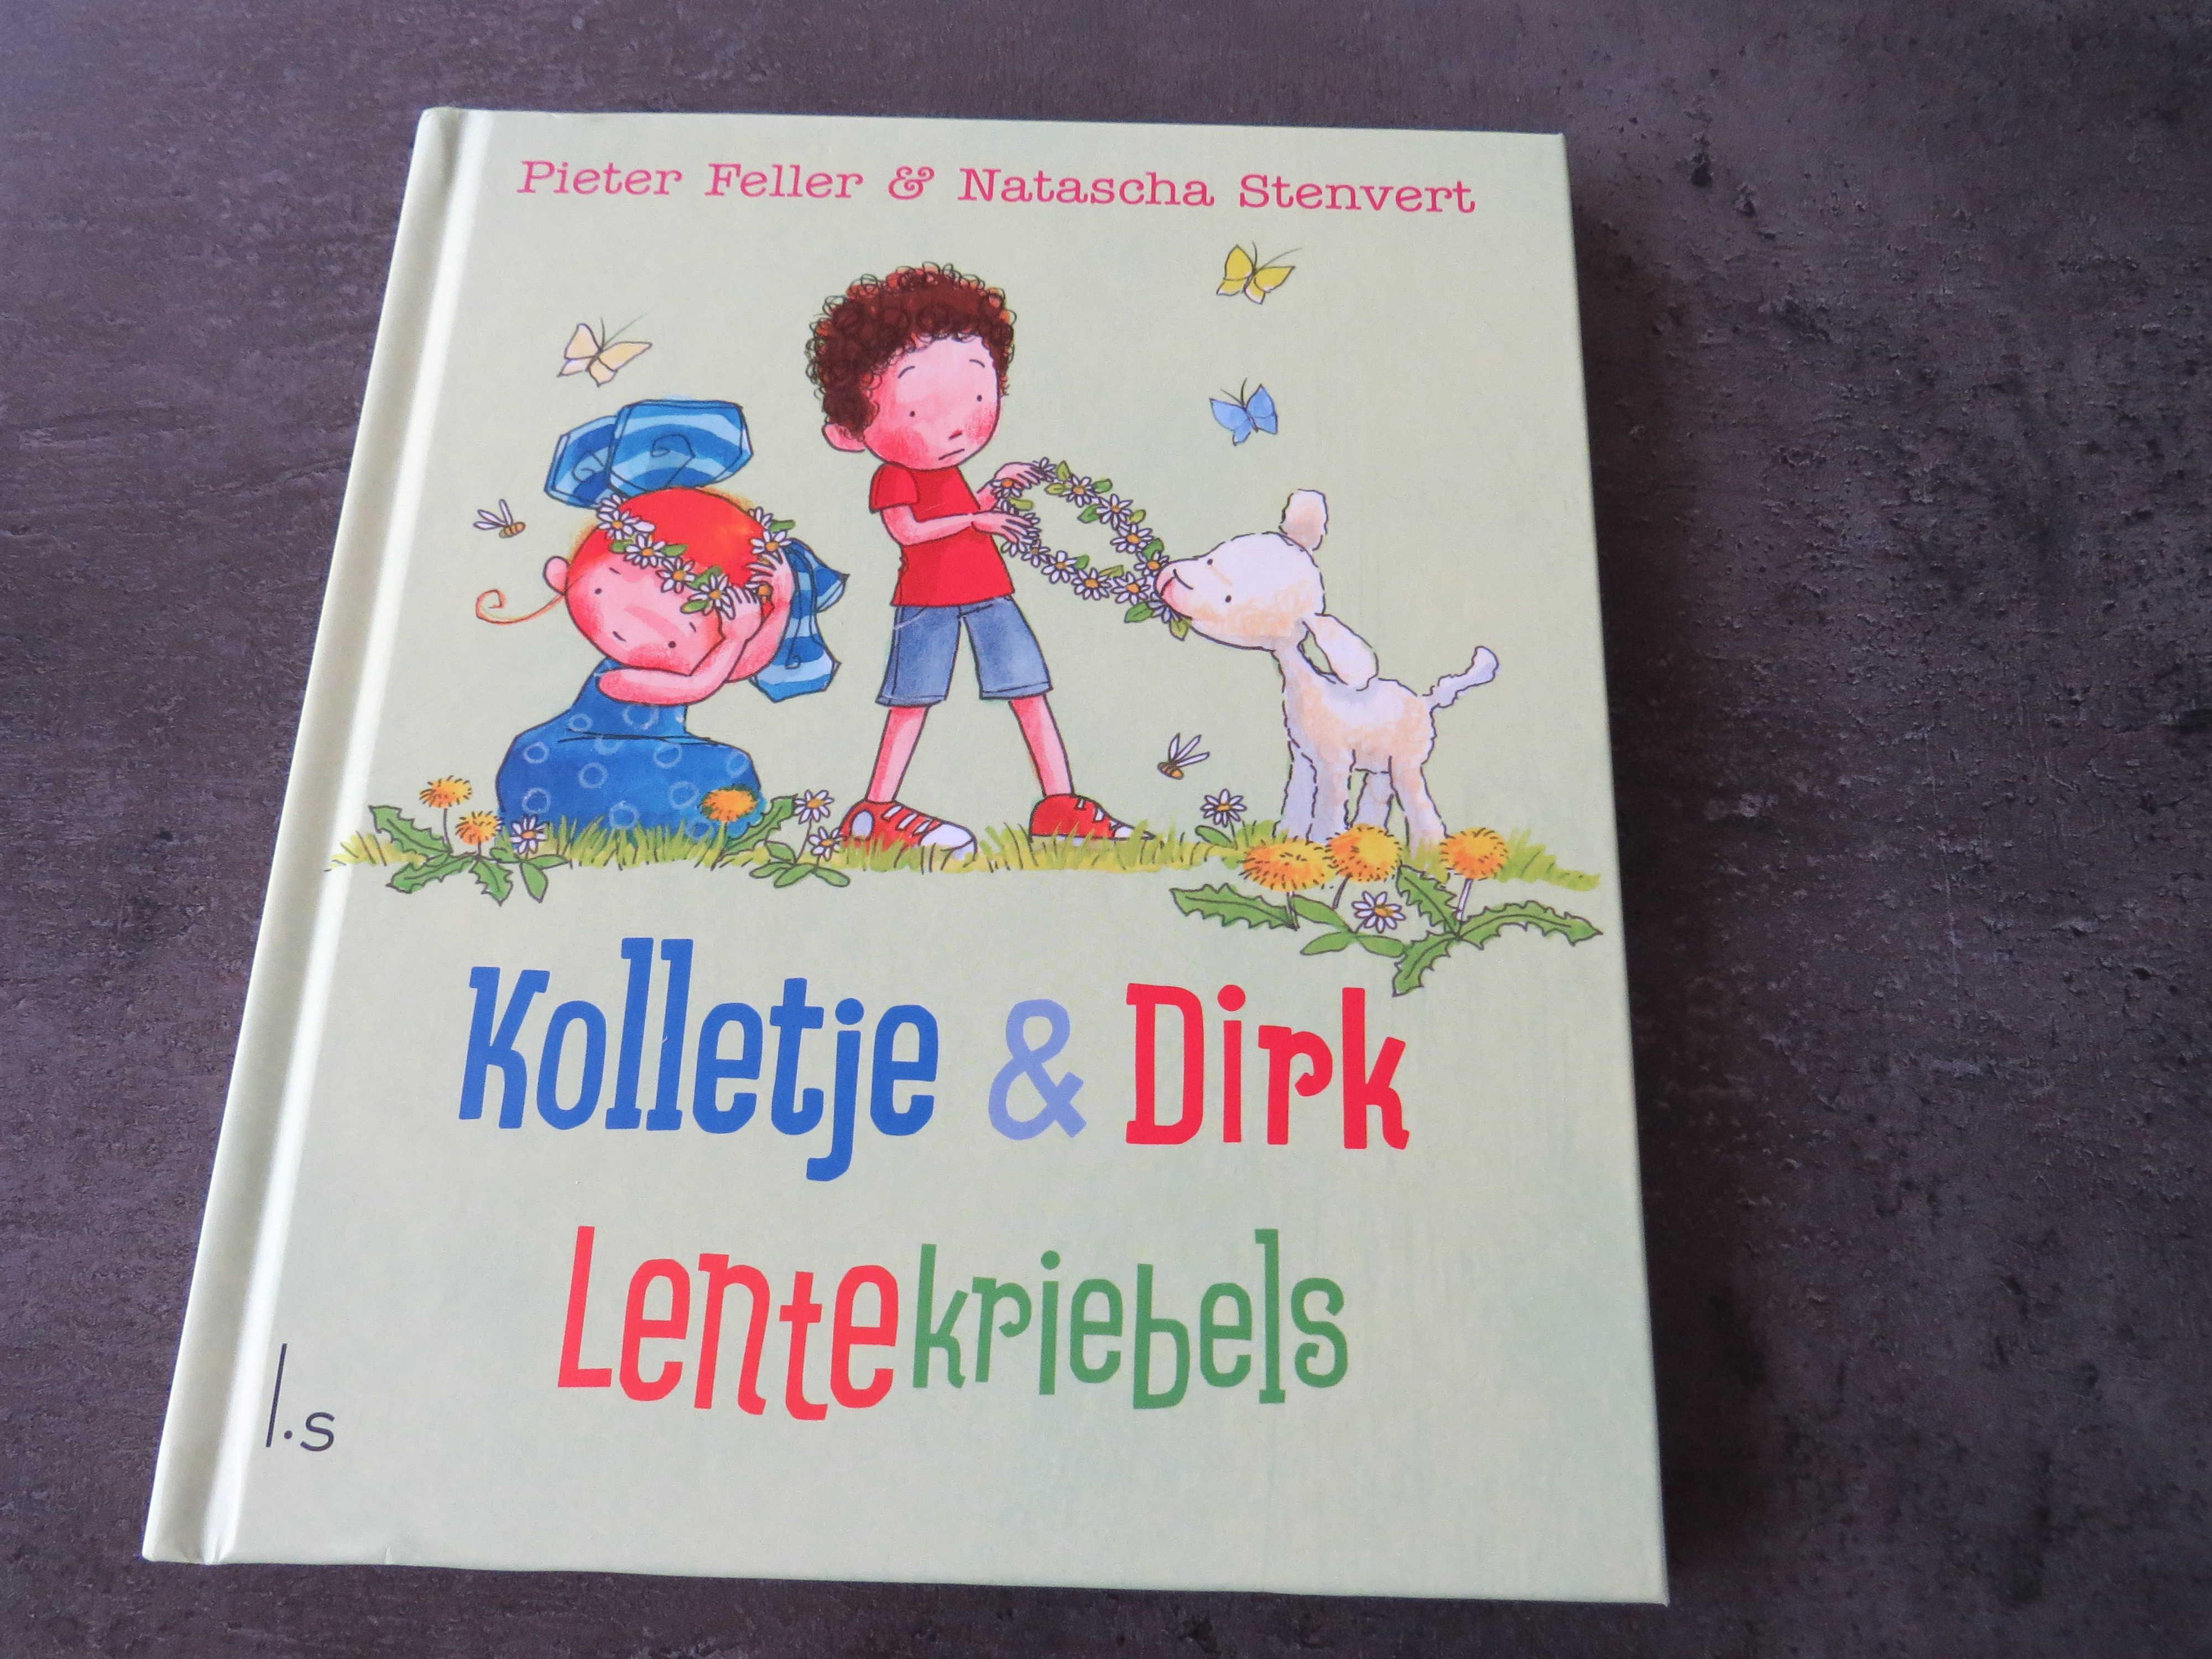 voorkant Kolletje & Dirk lentekriebels